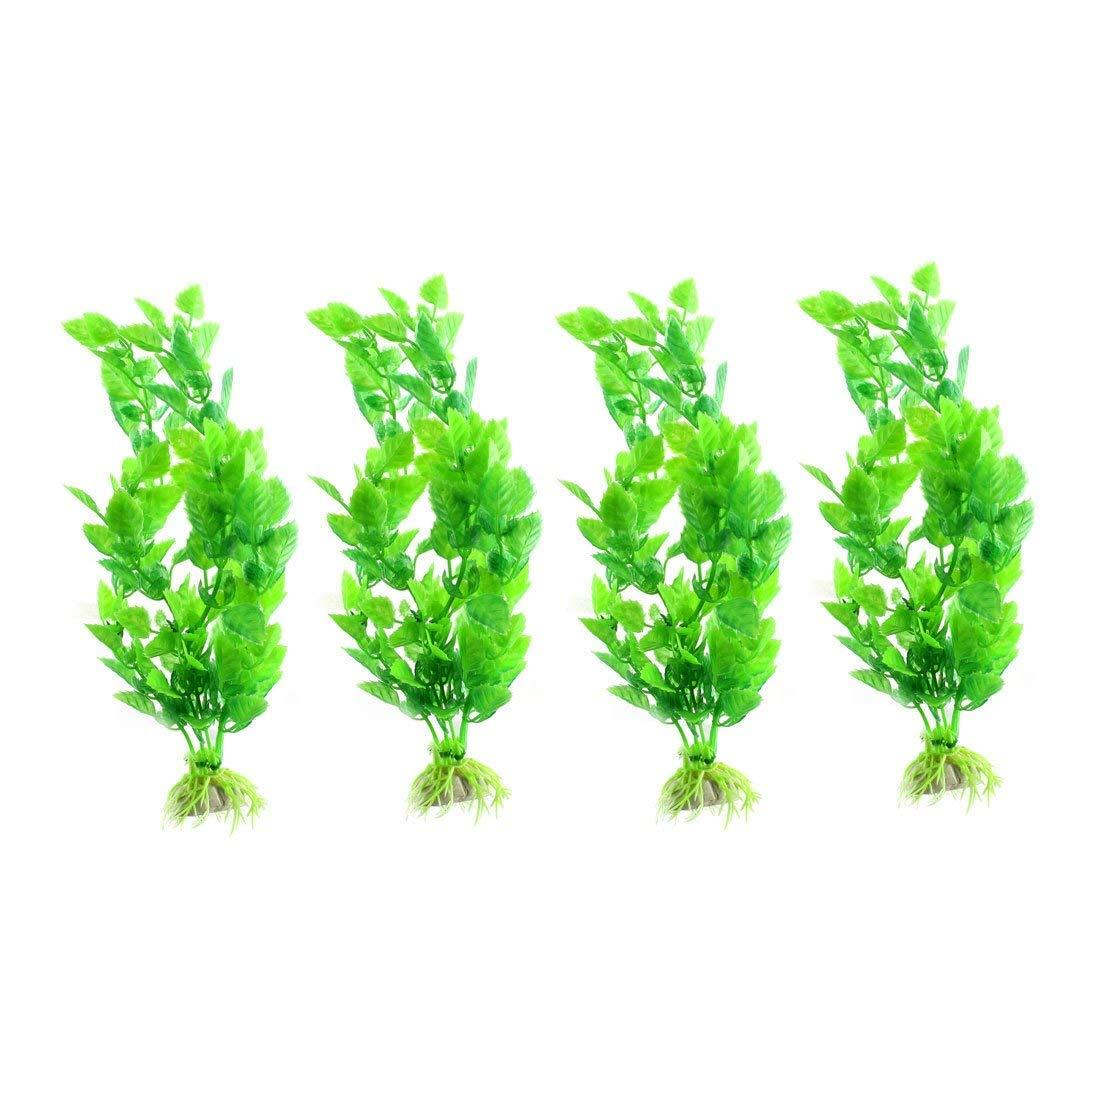 1Pc Silicone Aquarium Fish Tank Artificial Coconut Trees Shape Aquascaping Green